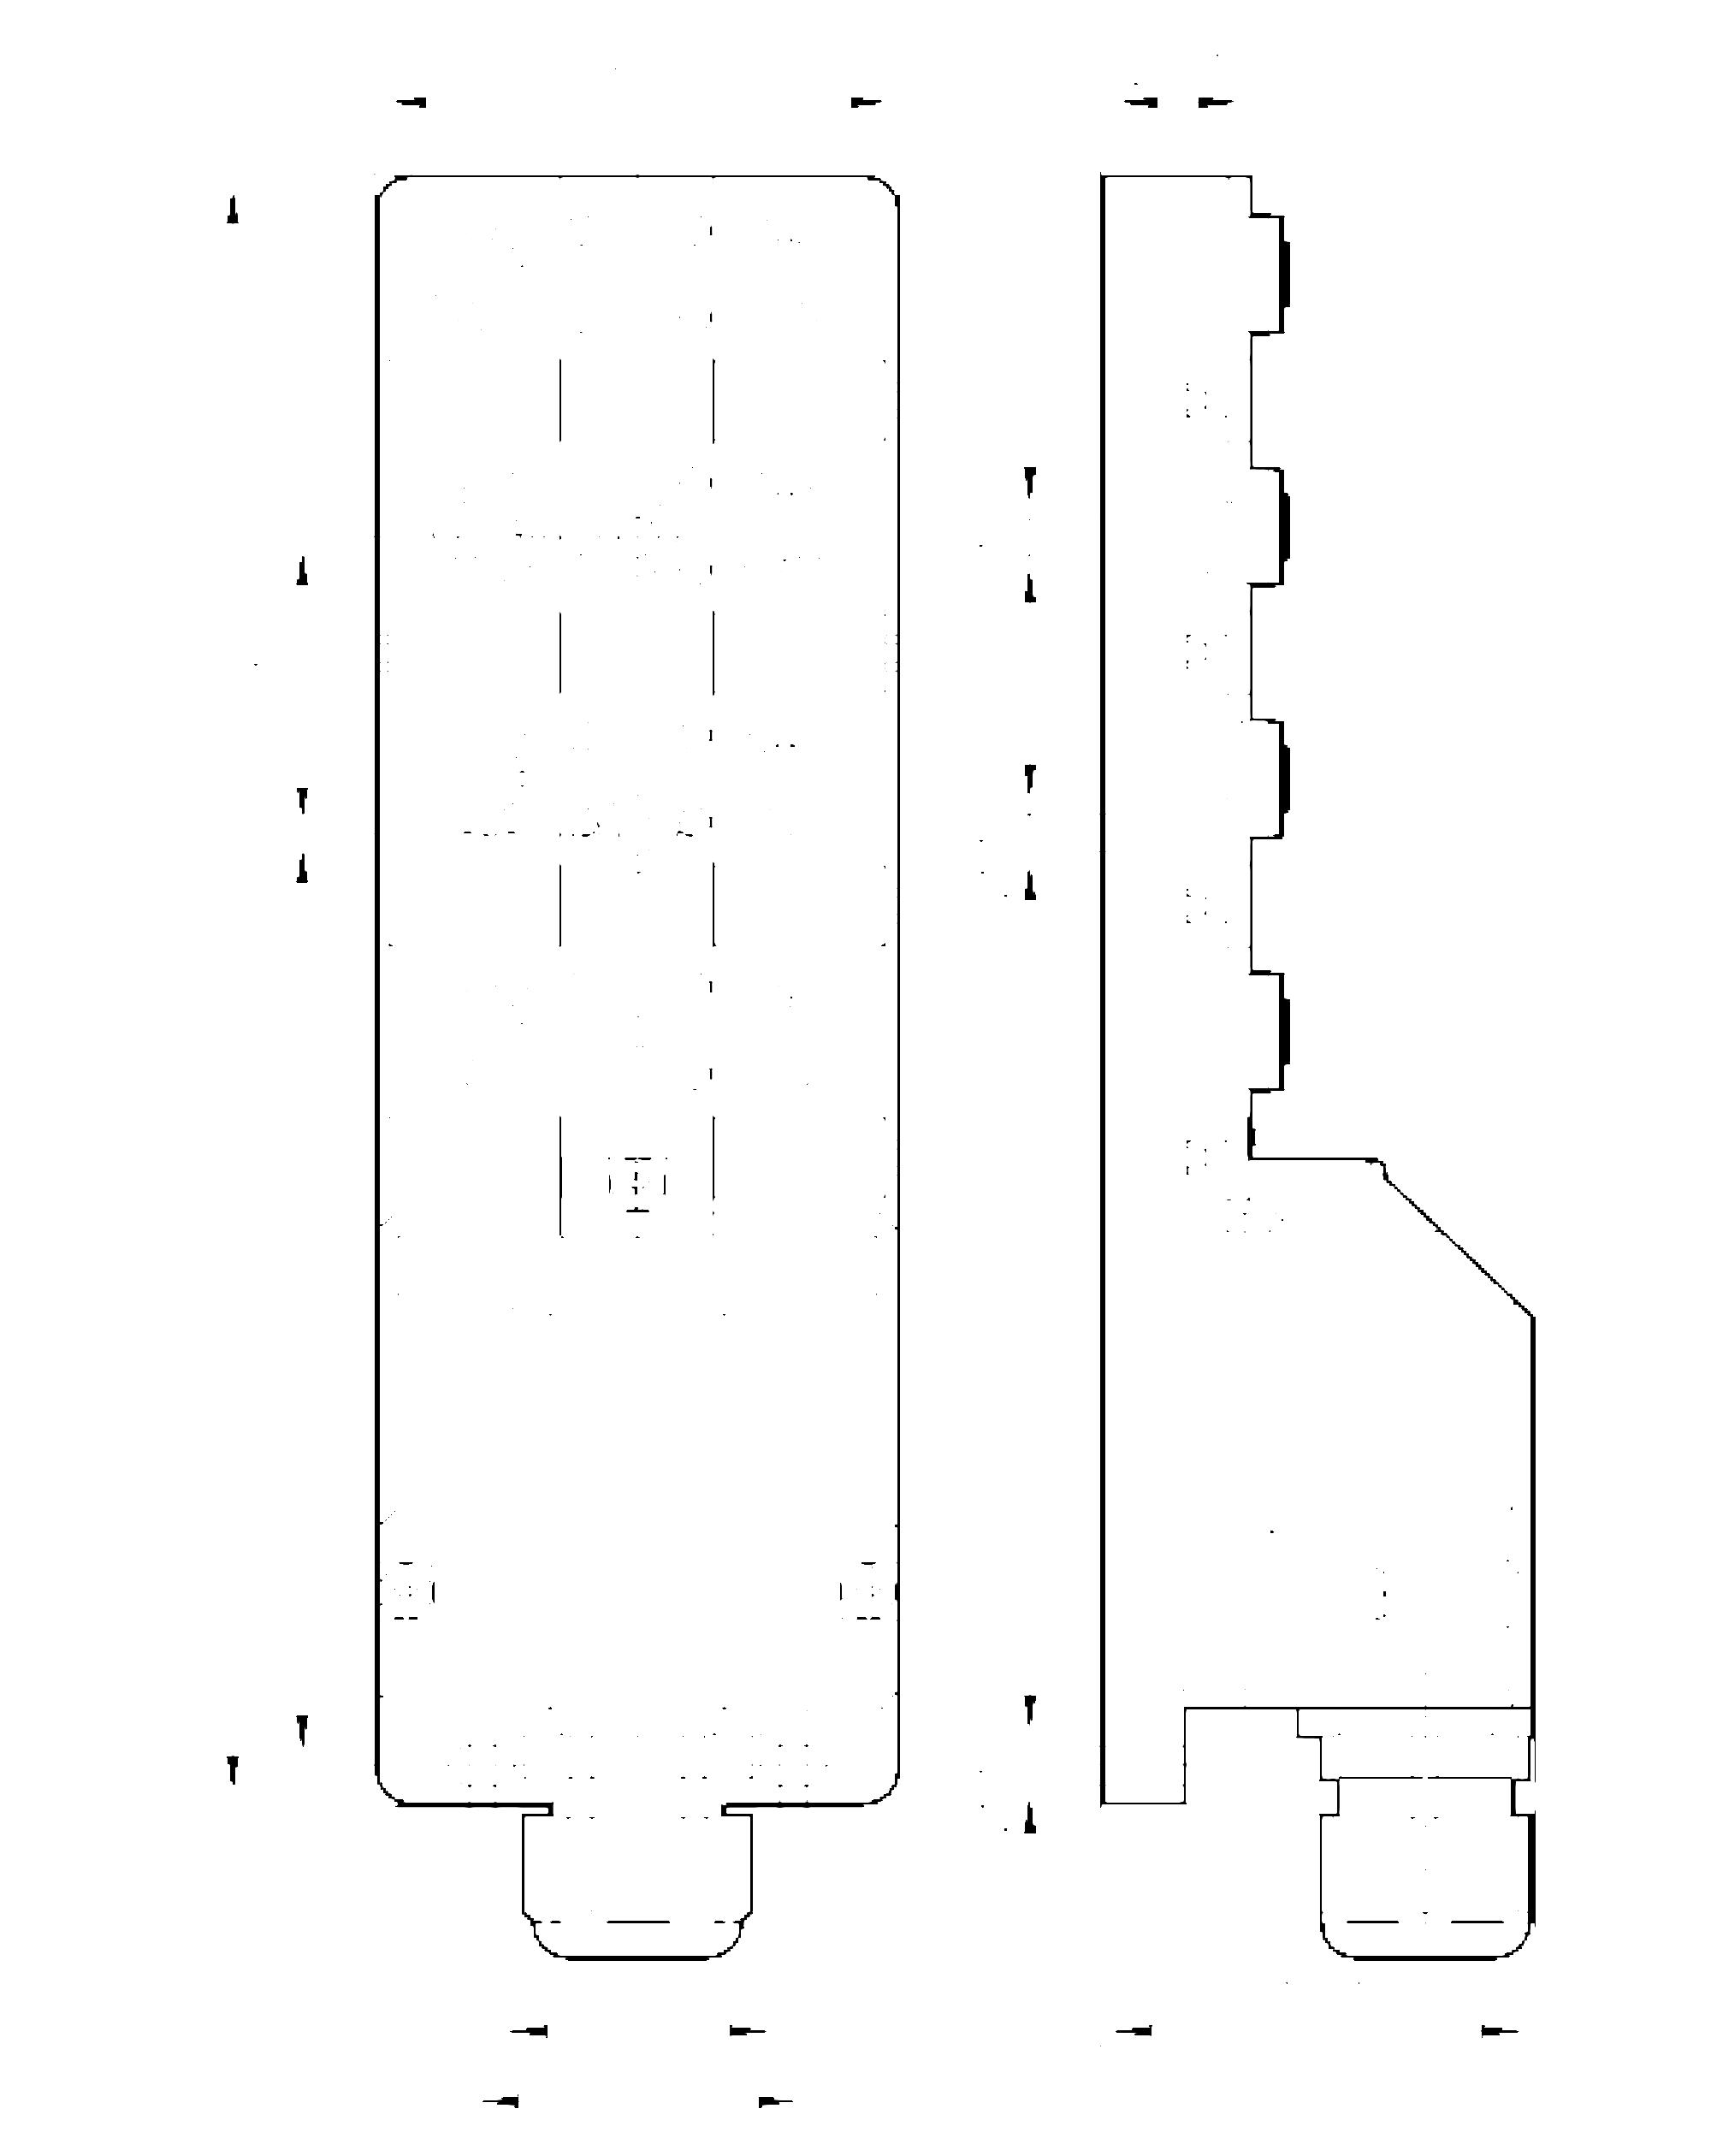 EBT005 - Splitter box - ifm electronic